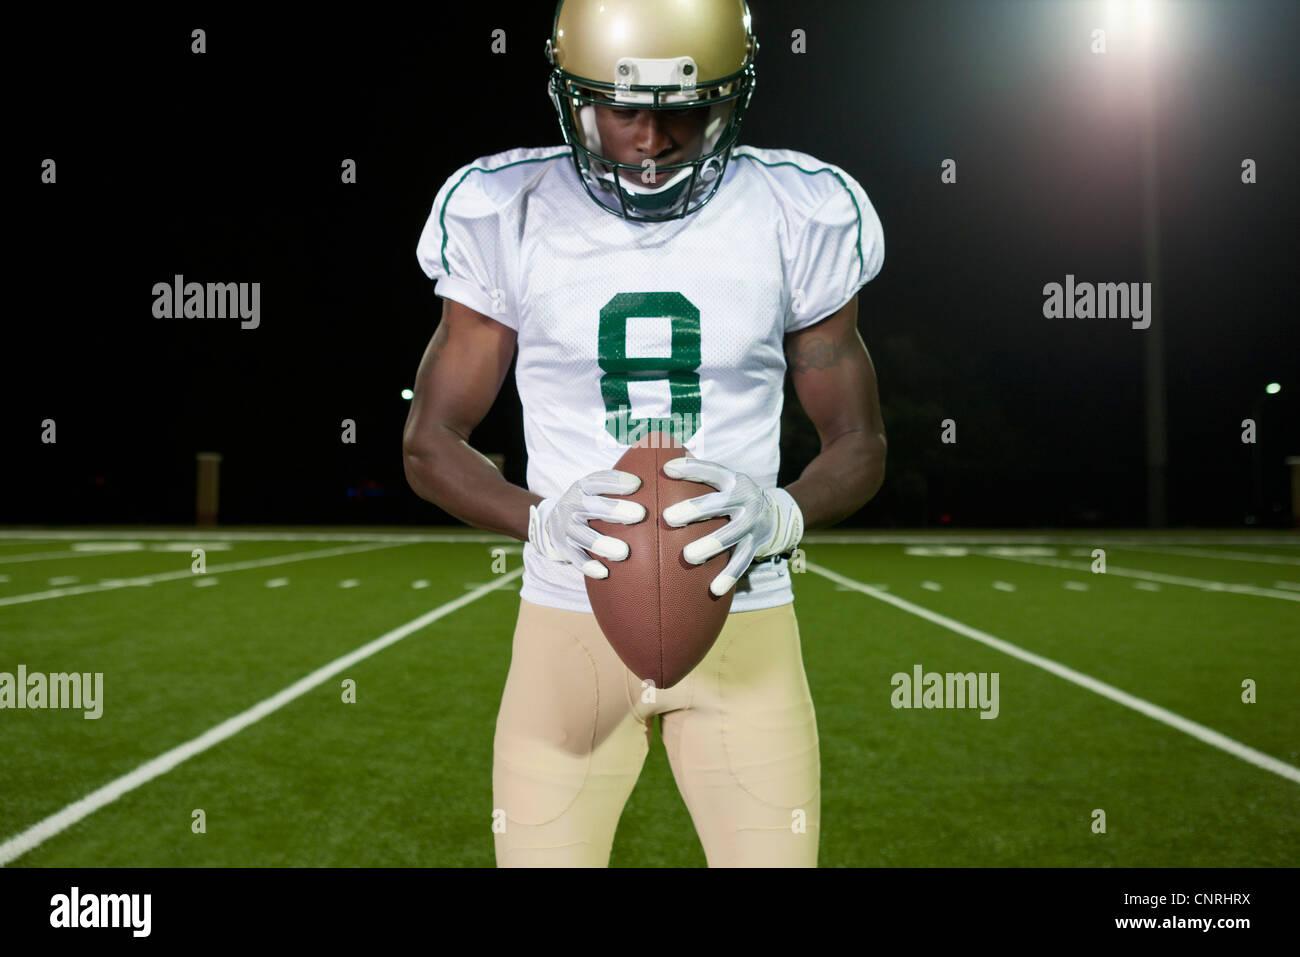 Football player holding football Stock Photo